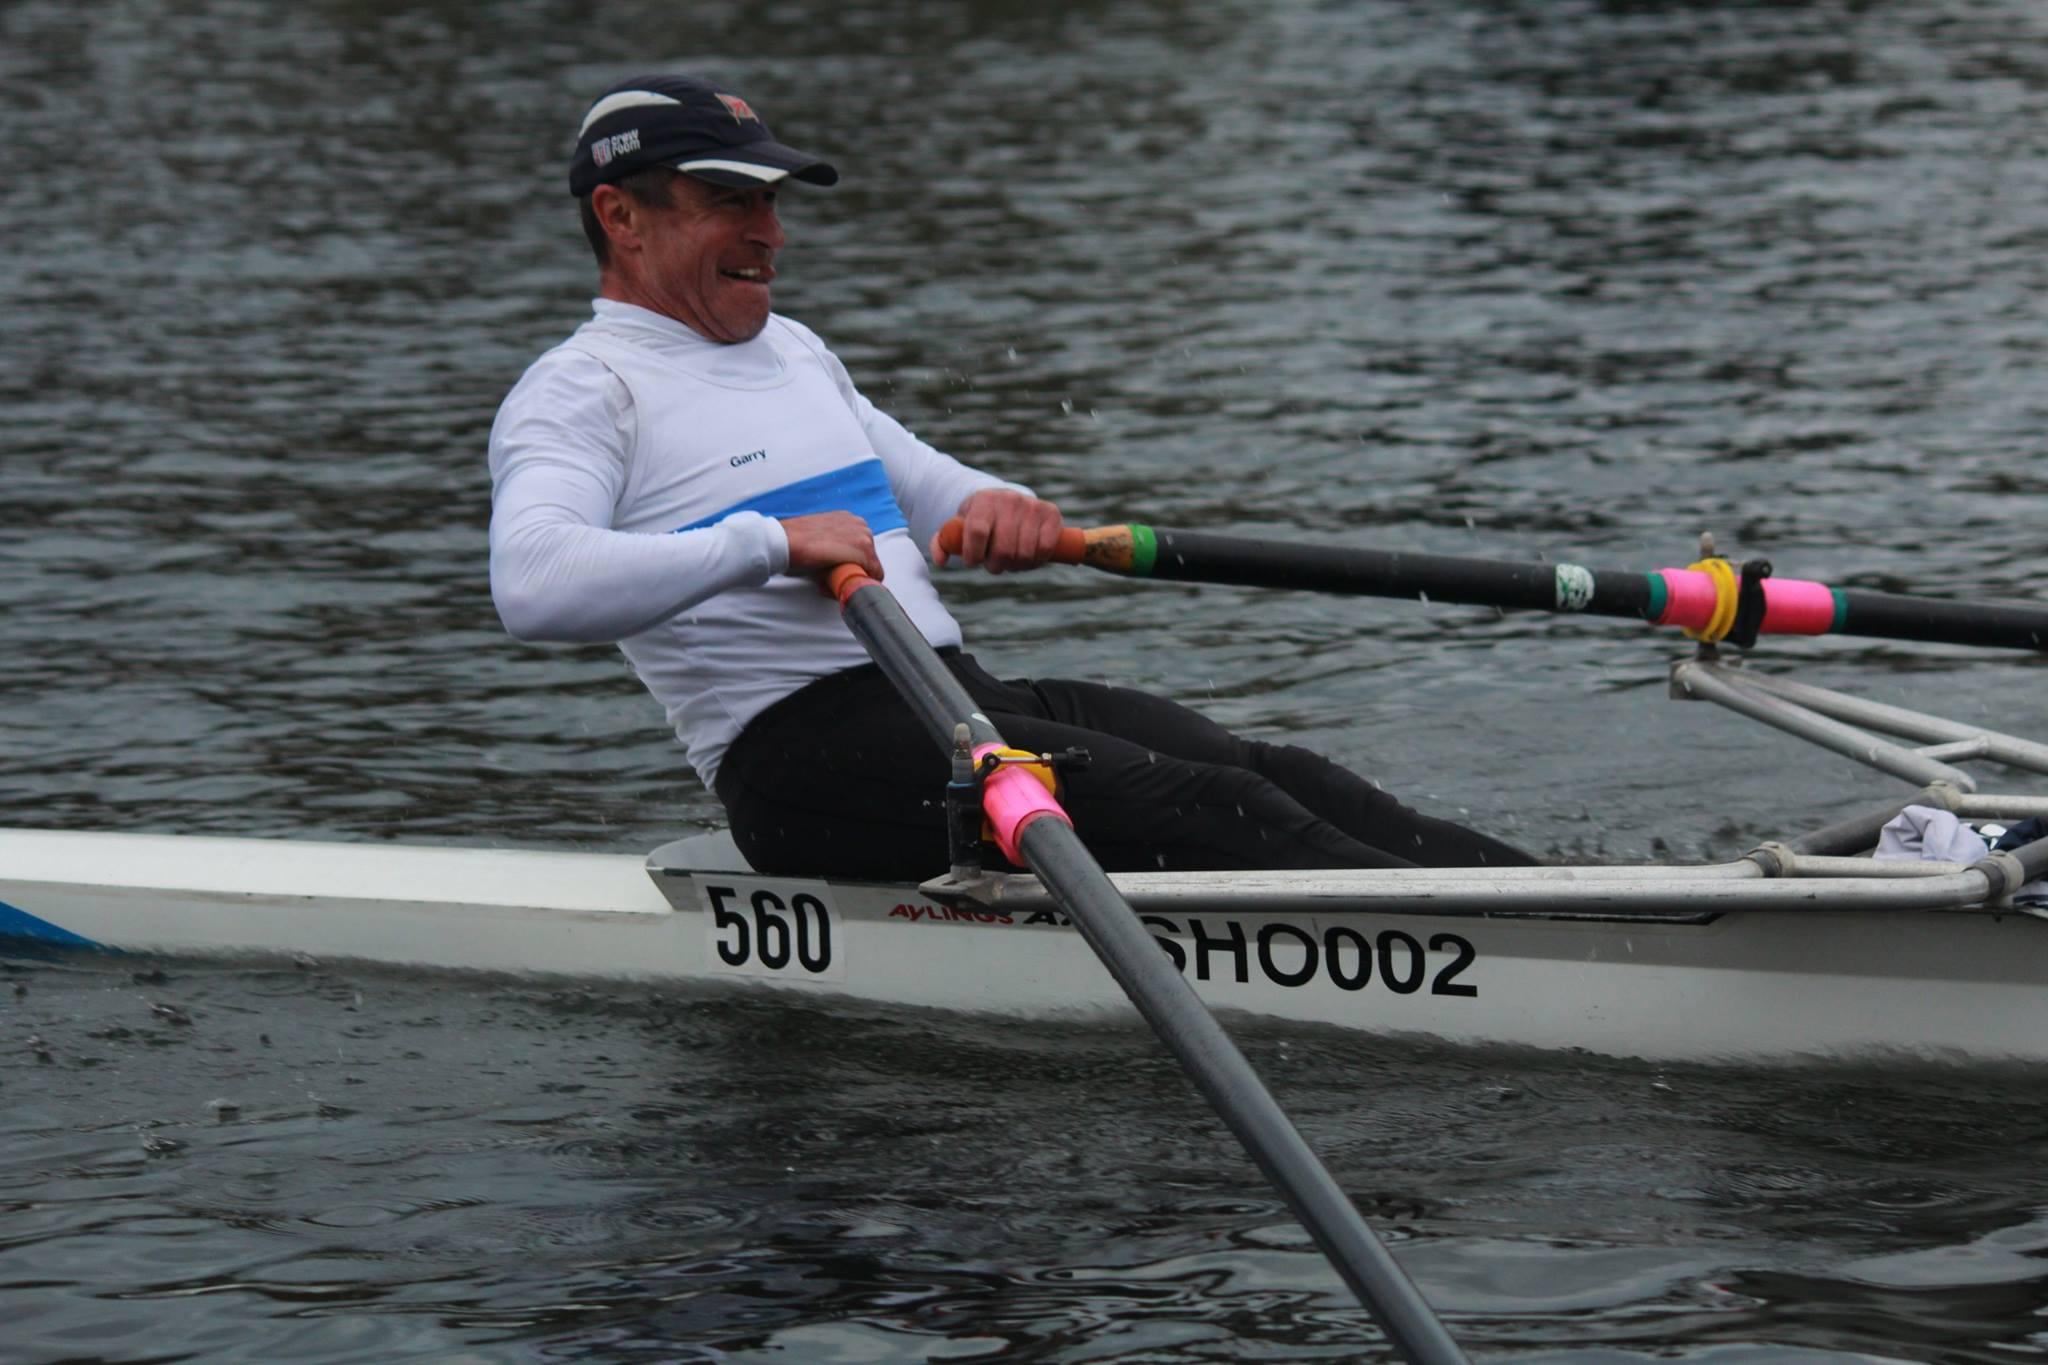 Shoreham's Saunders is British Rowing Volunteer of the Year